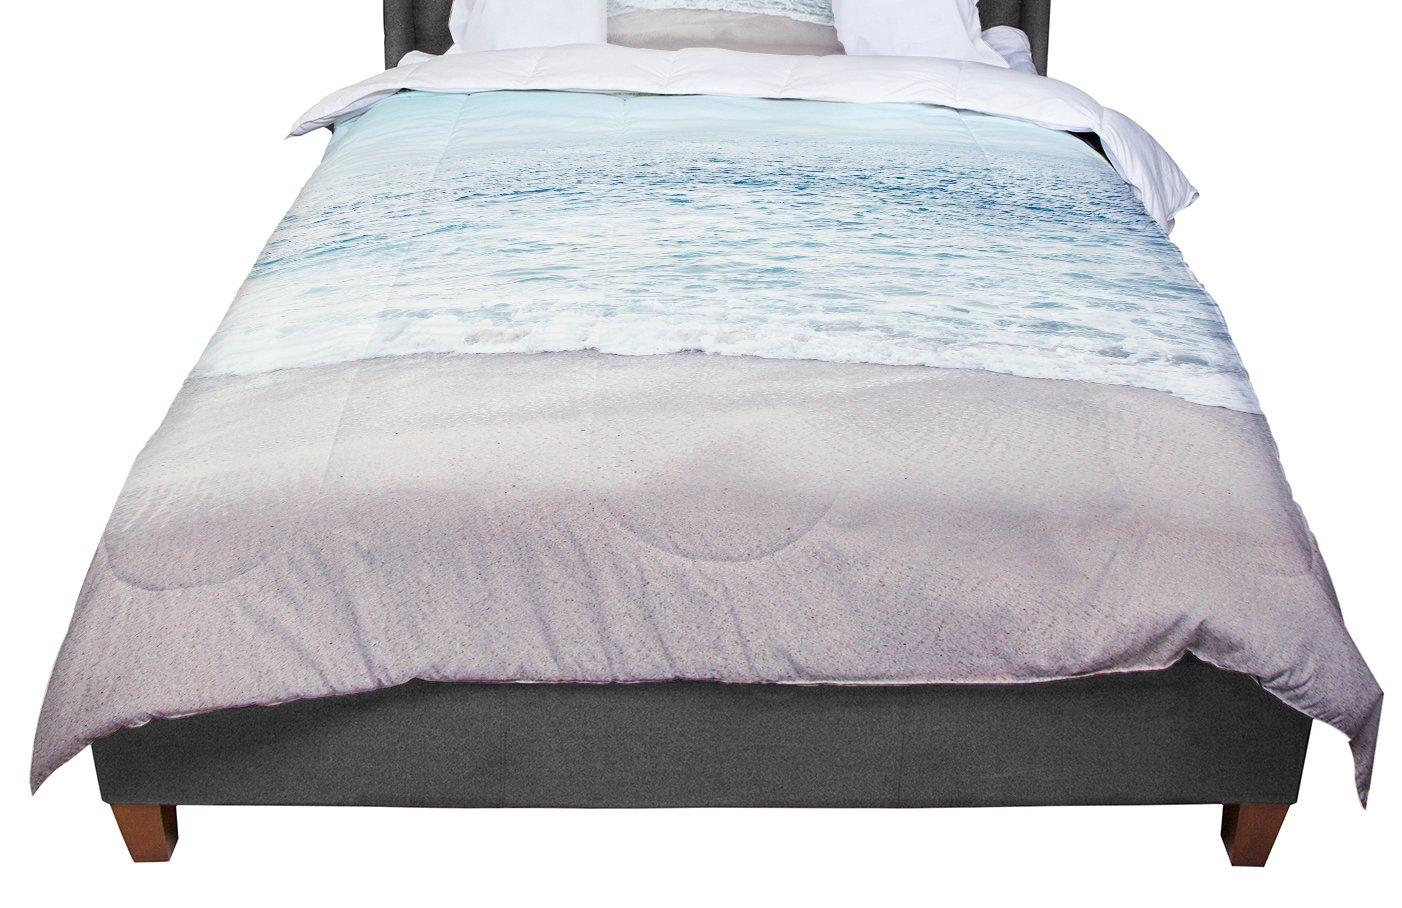 KESS InHouse Monika Strigel The Sea Blue Coastal Queen Comforter 88 X 88